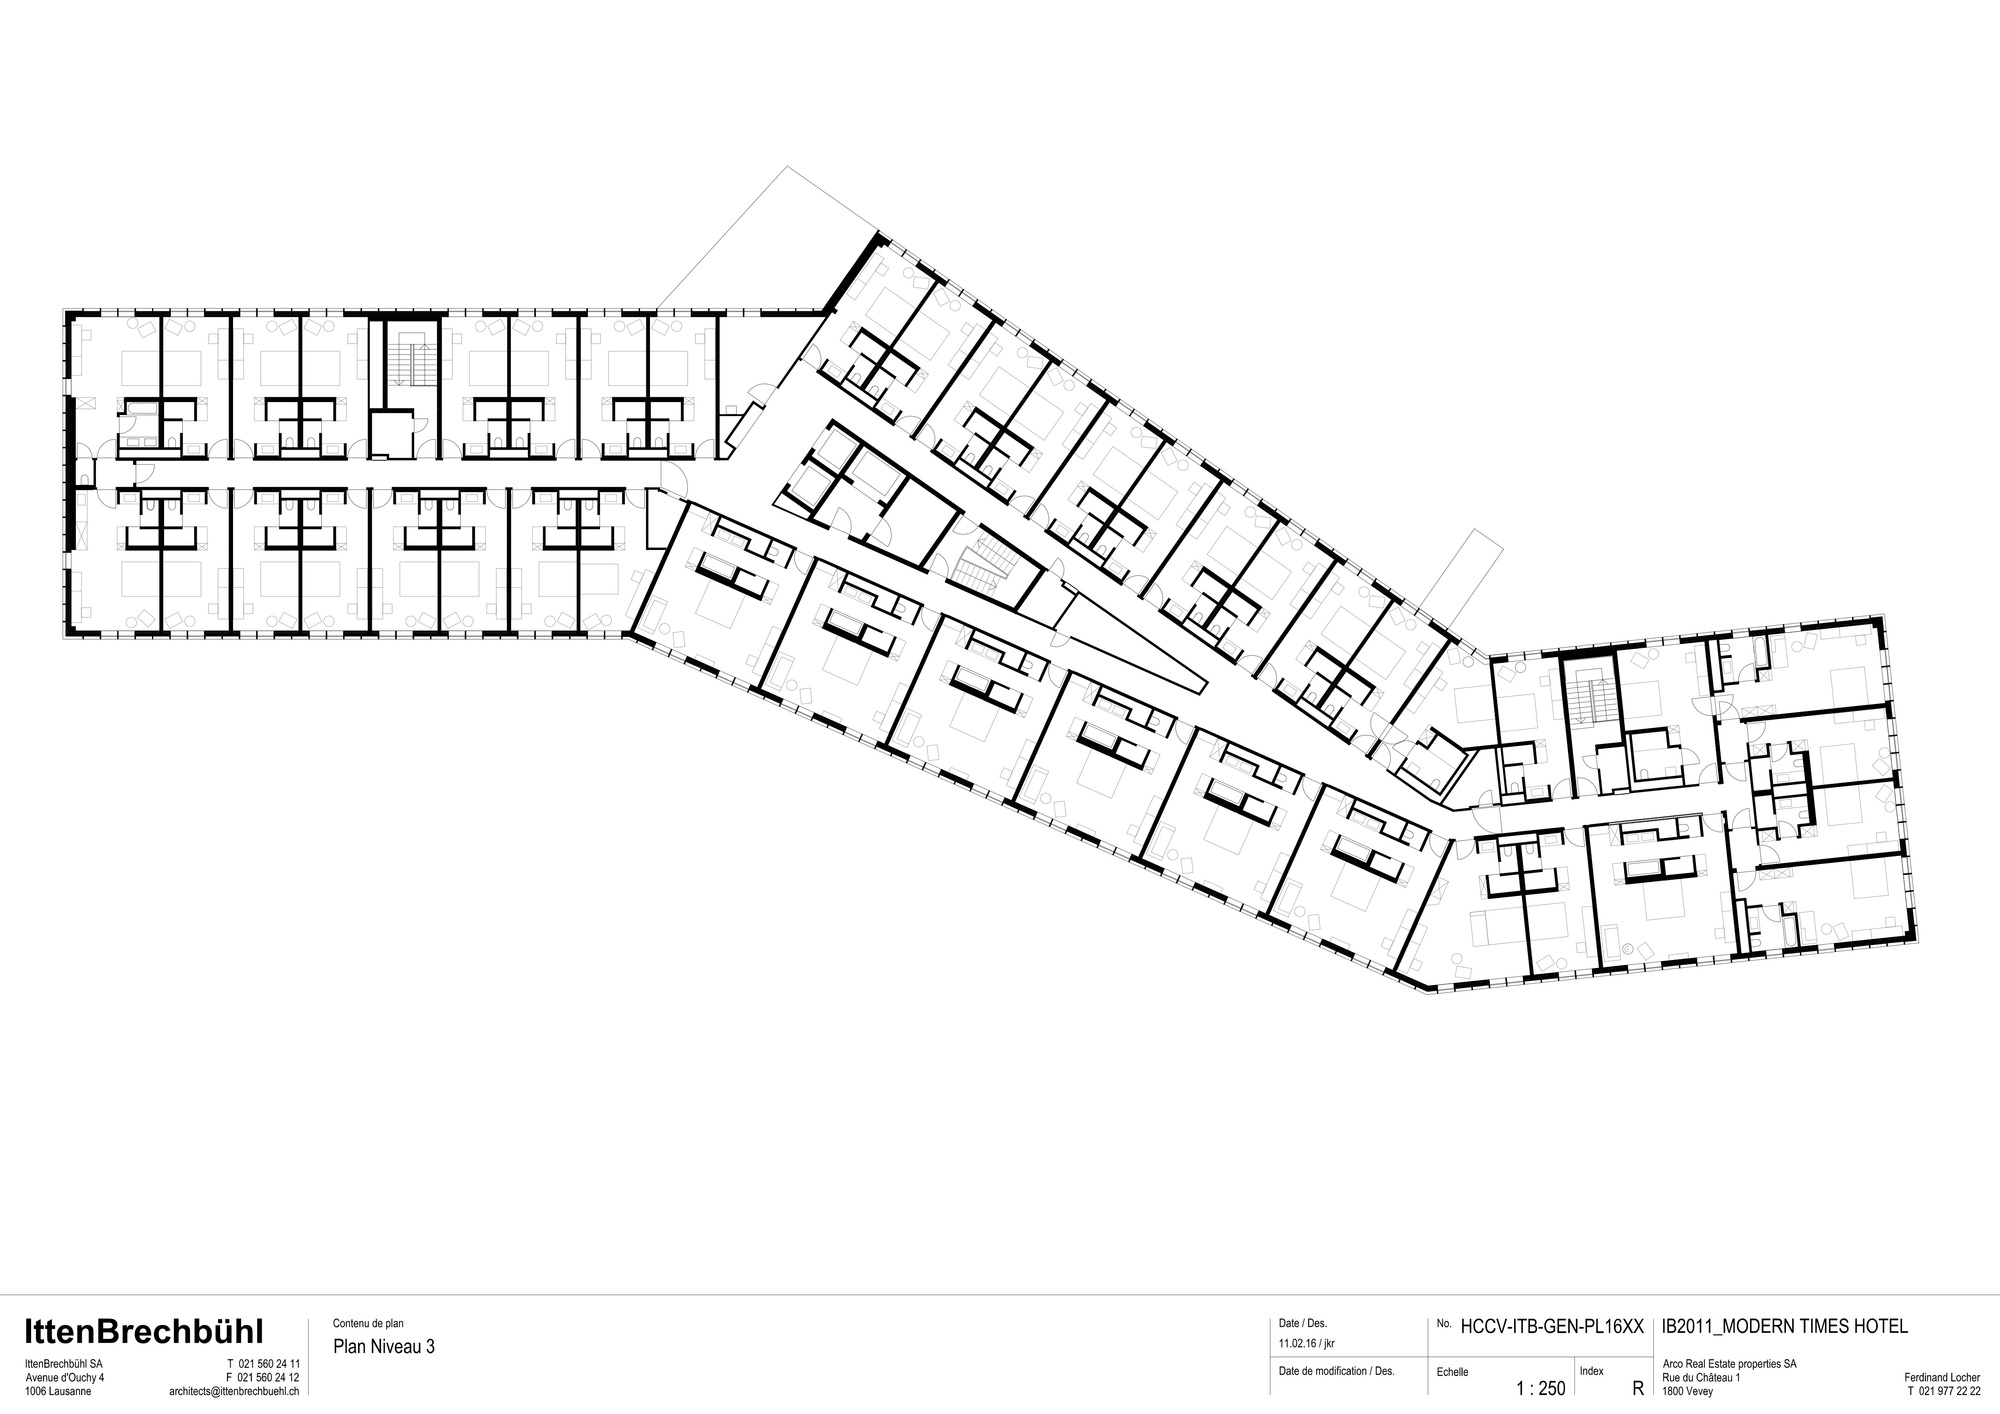 Gallery of modern times hotel itten brechb hl 29 for Modern layout house plan